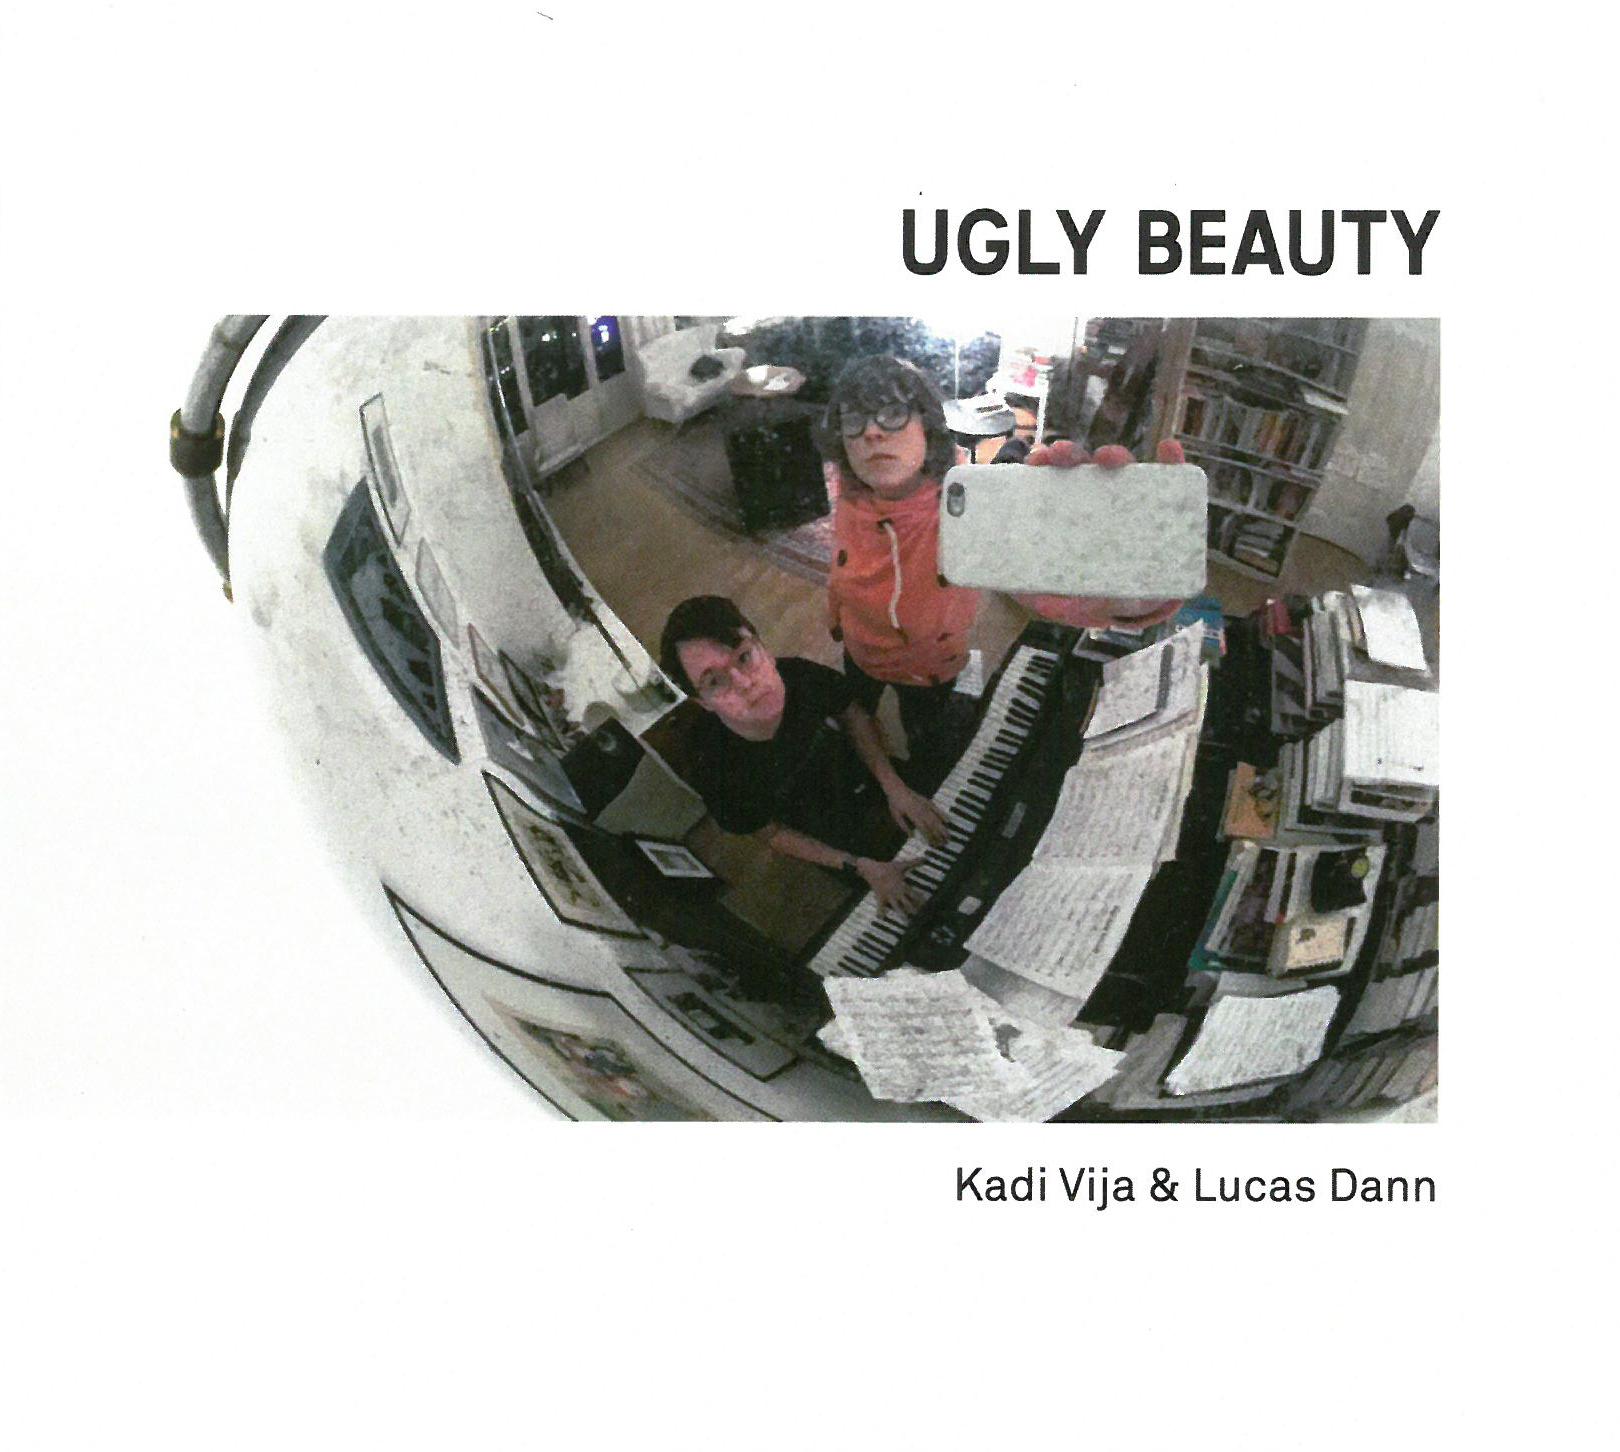 KADI VIJA - Kadi Vija & Lucas Dann : Ugly Beauty cover